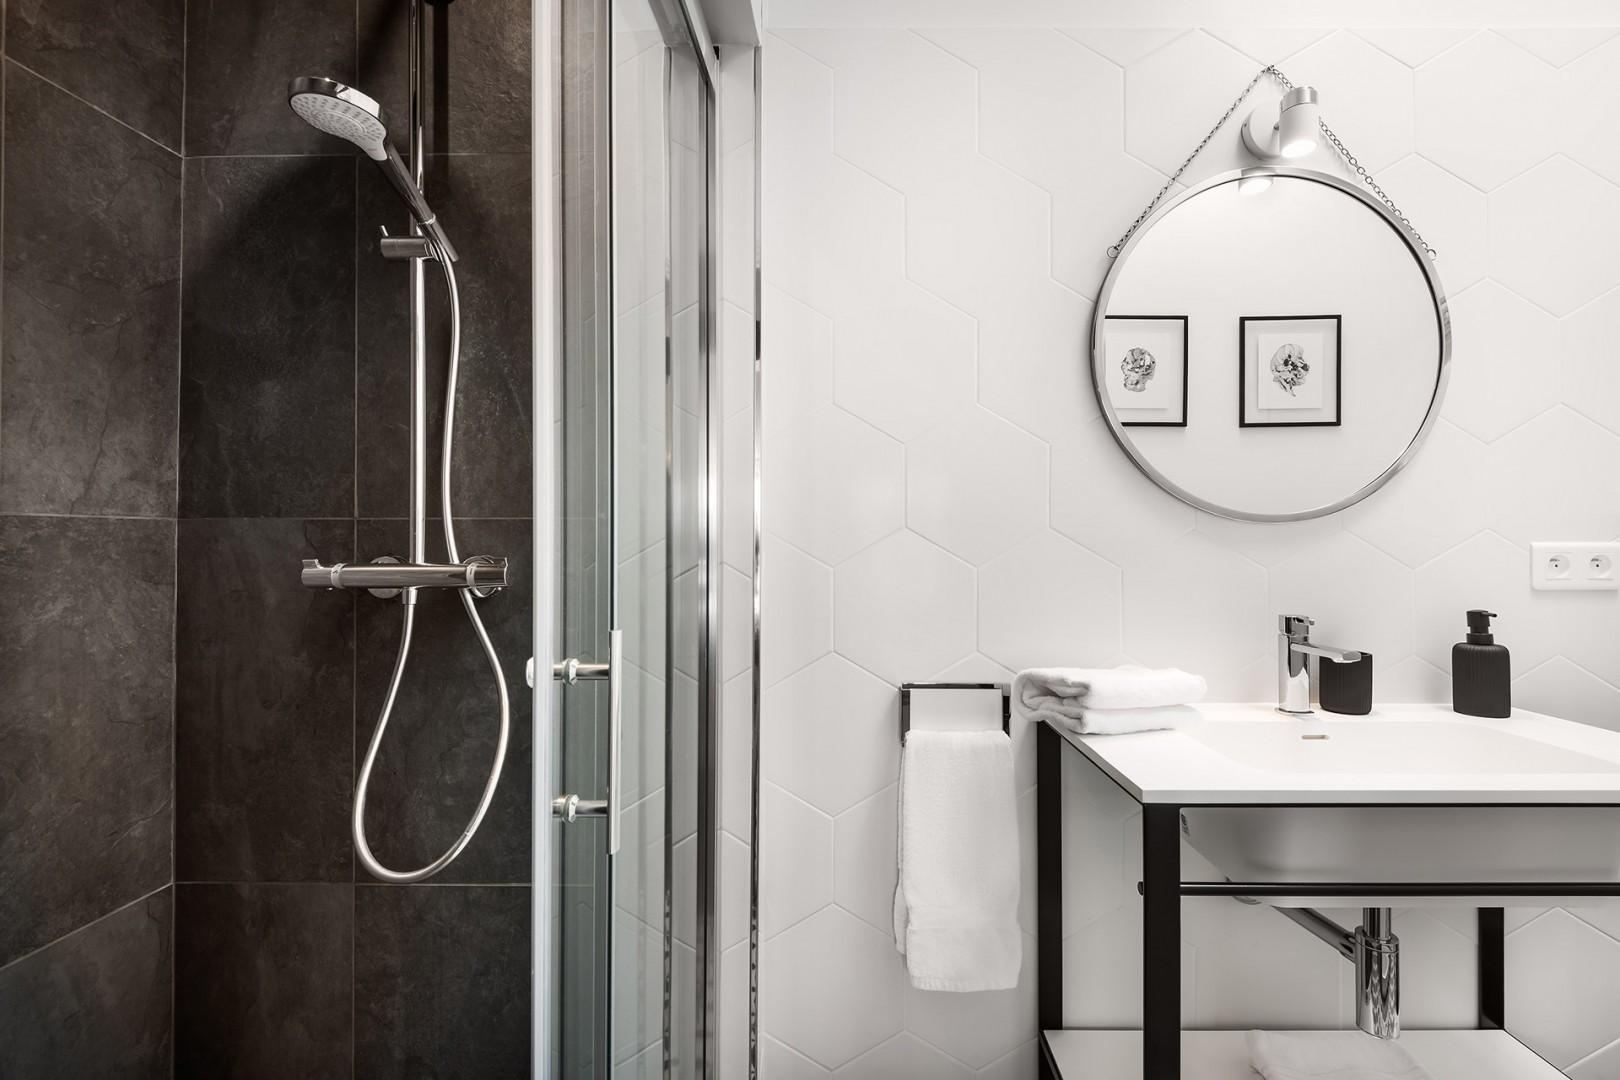 Enjoy the high-end amenities of bathroom 3.